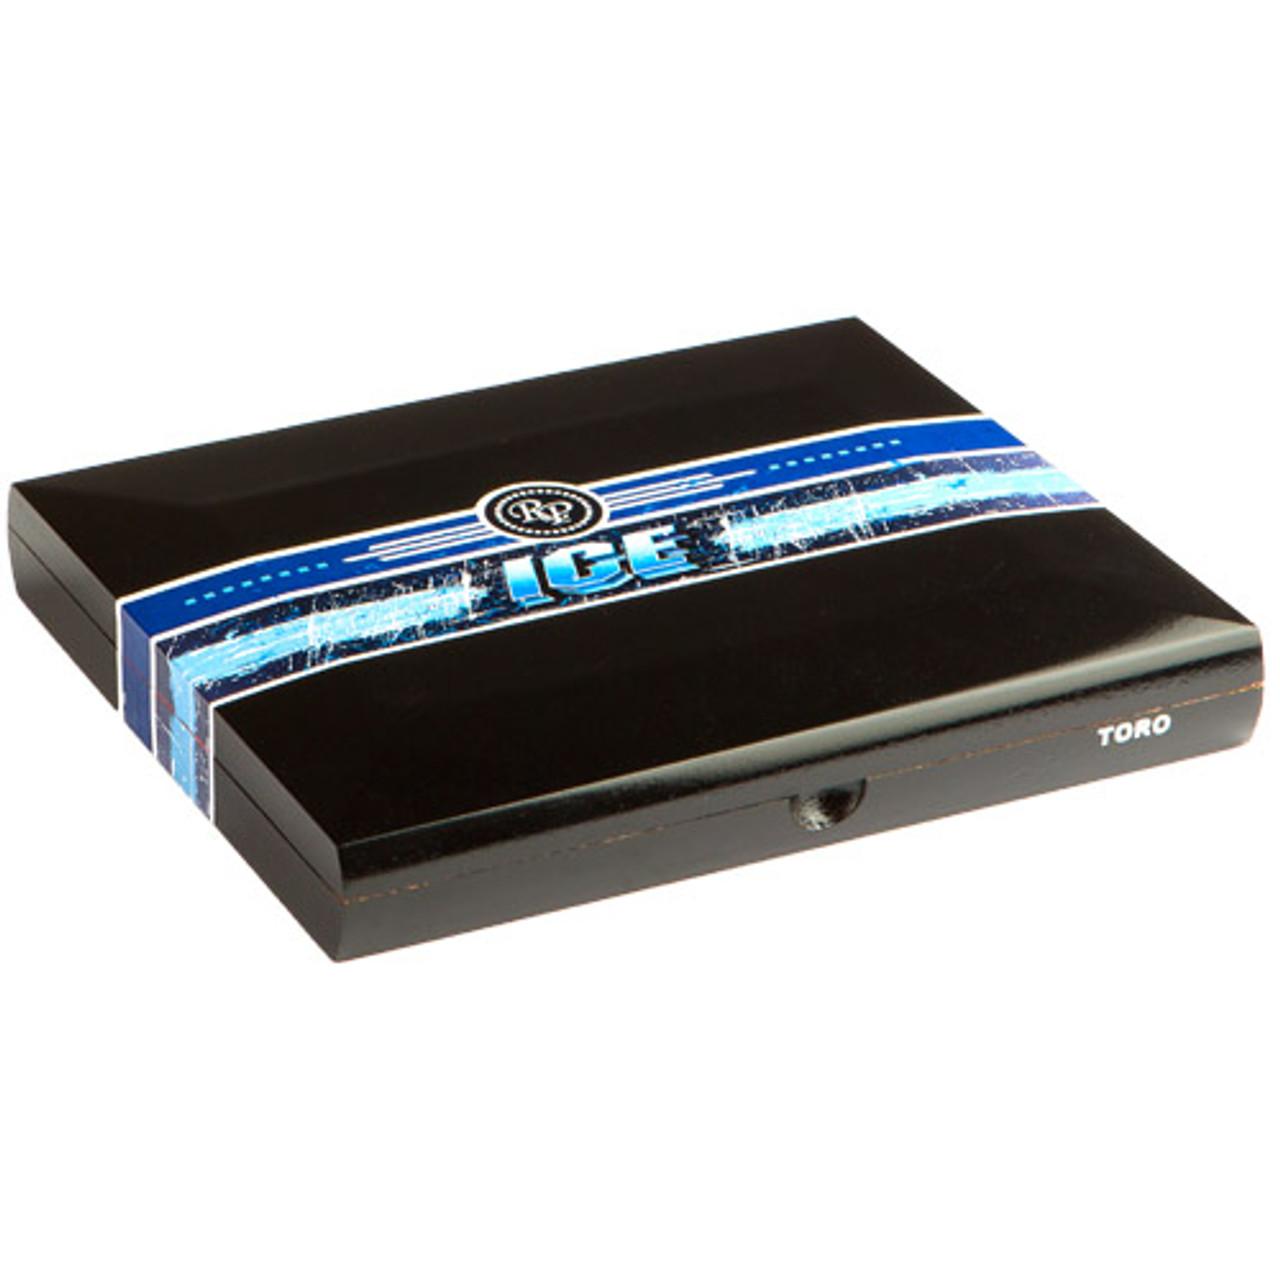 Rocky Patel Ice Torpedo Cigars - 6.12 x 52 (Box of 10)